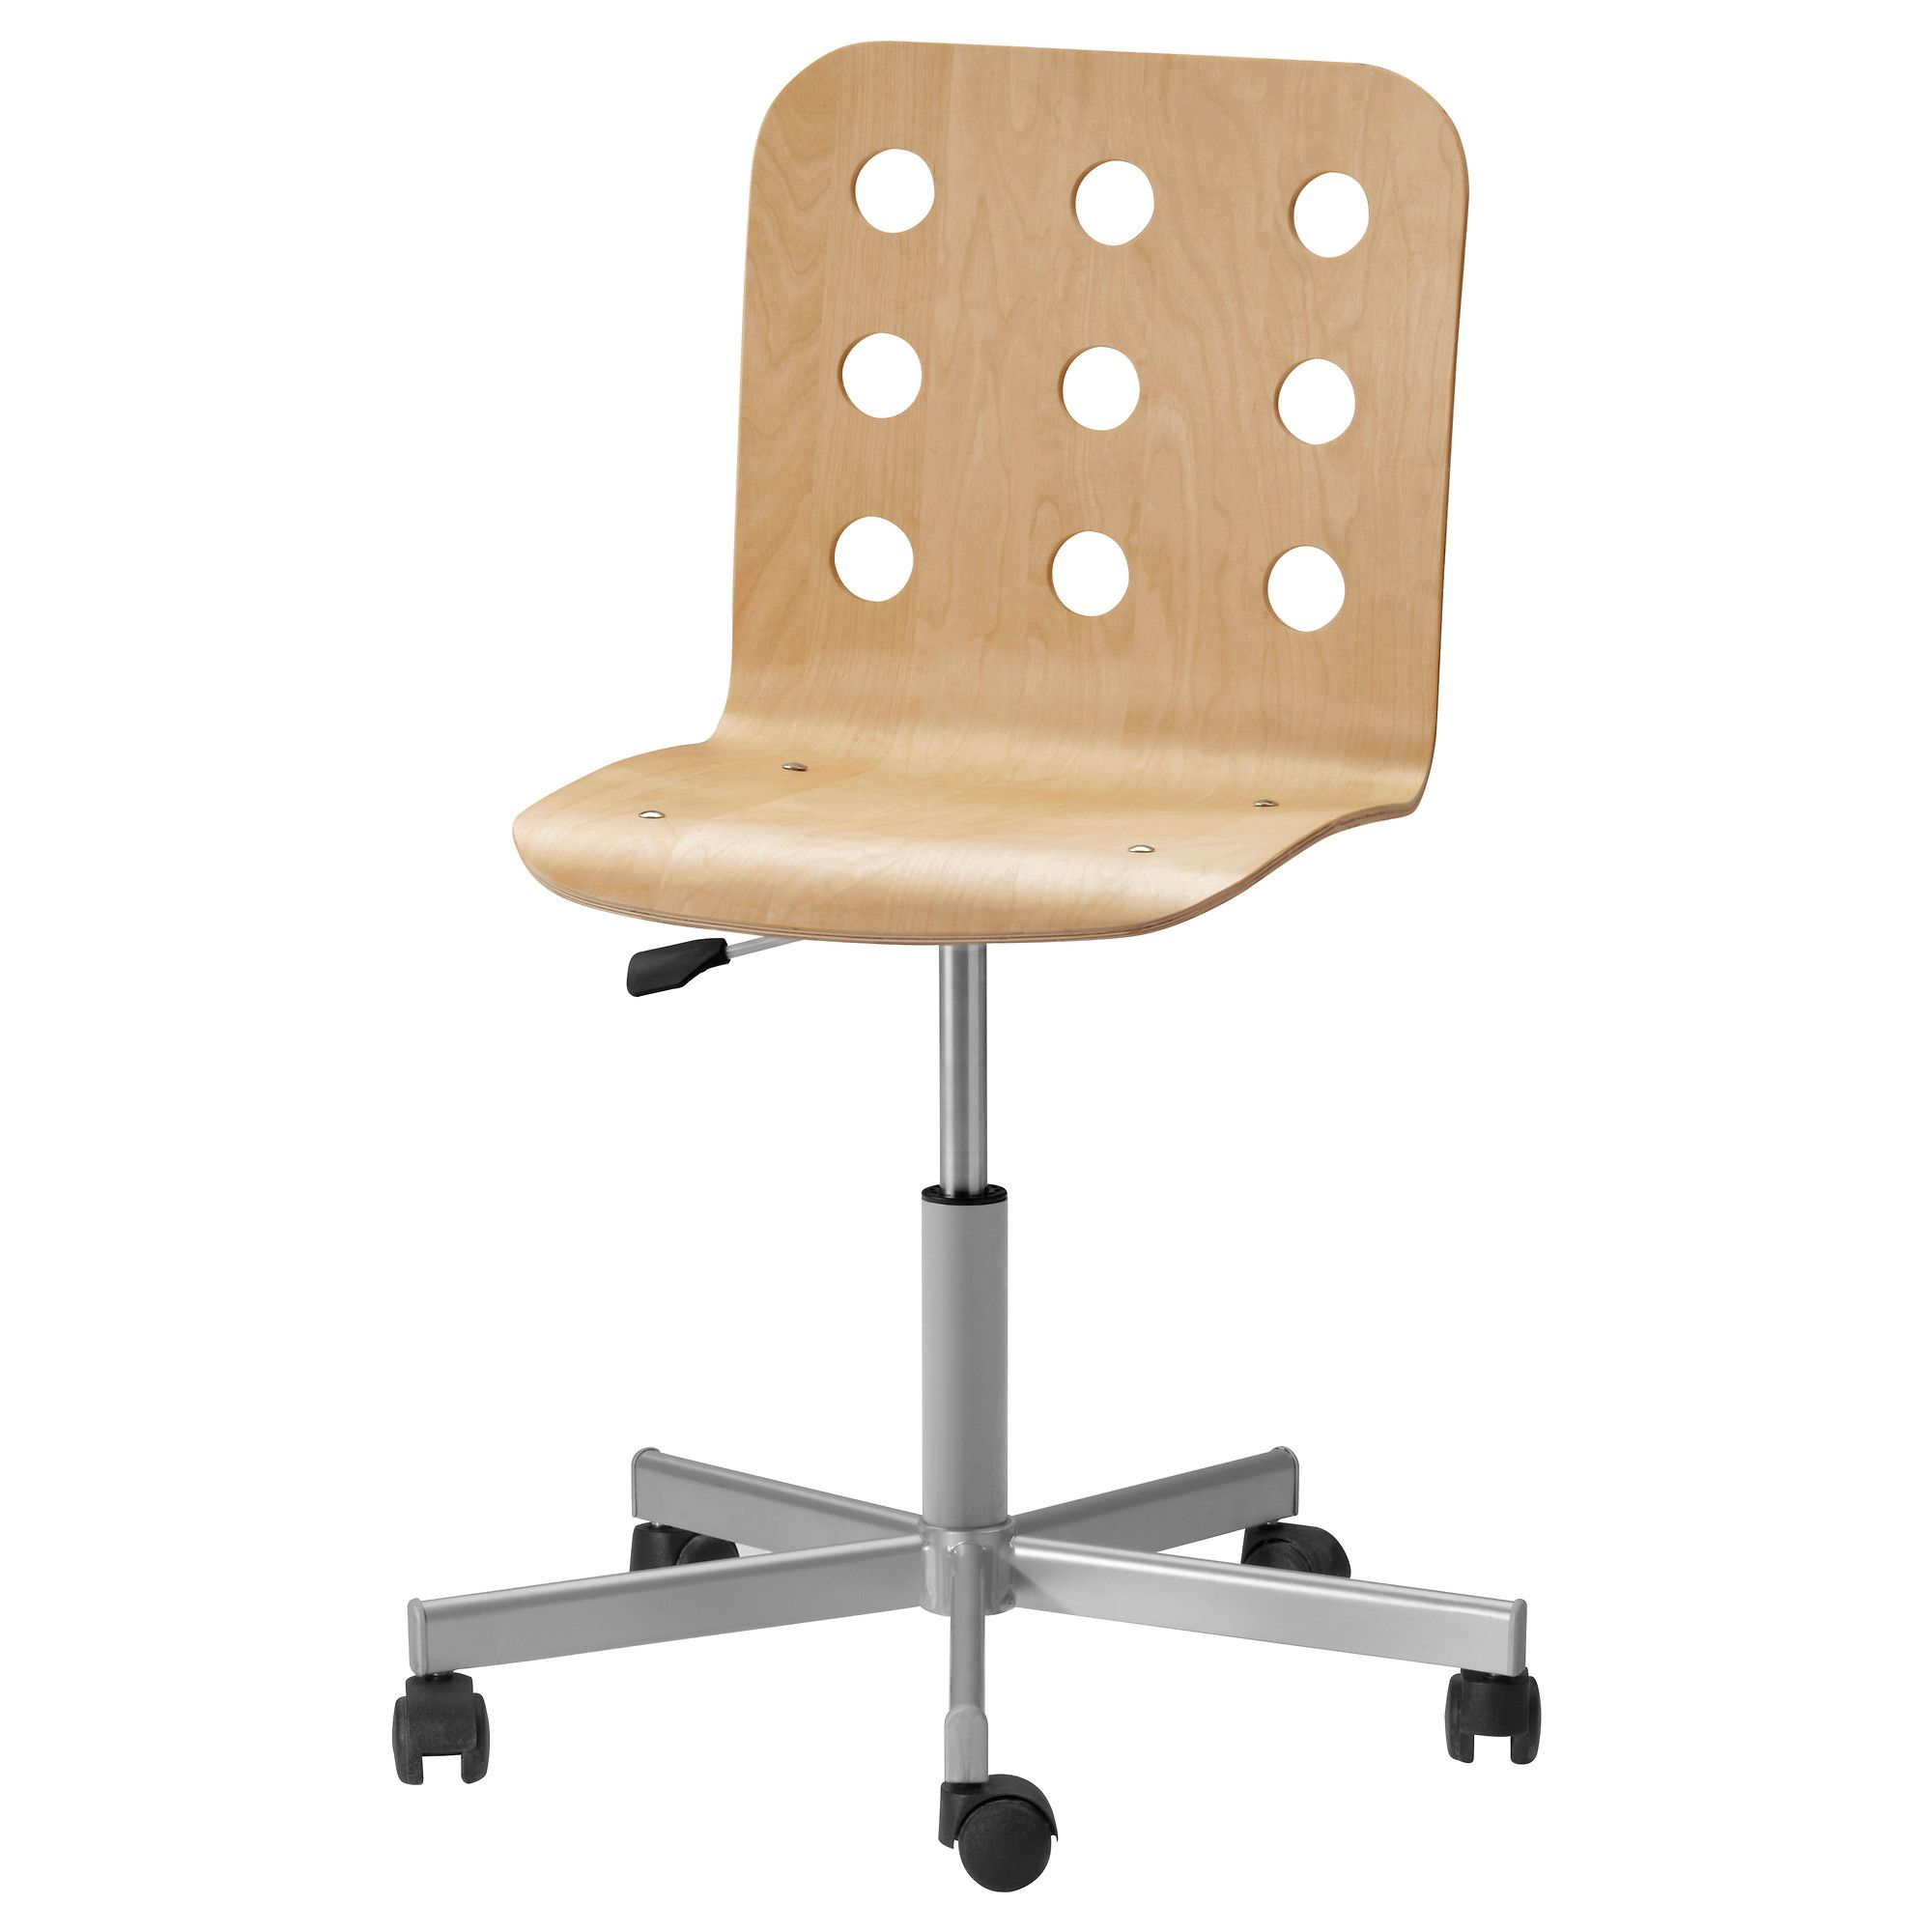 Schreibtischstuhl ikea kind  JULES Otočná stolička - breza/strieborná - IKEA | Cool stuff to ...